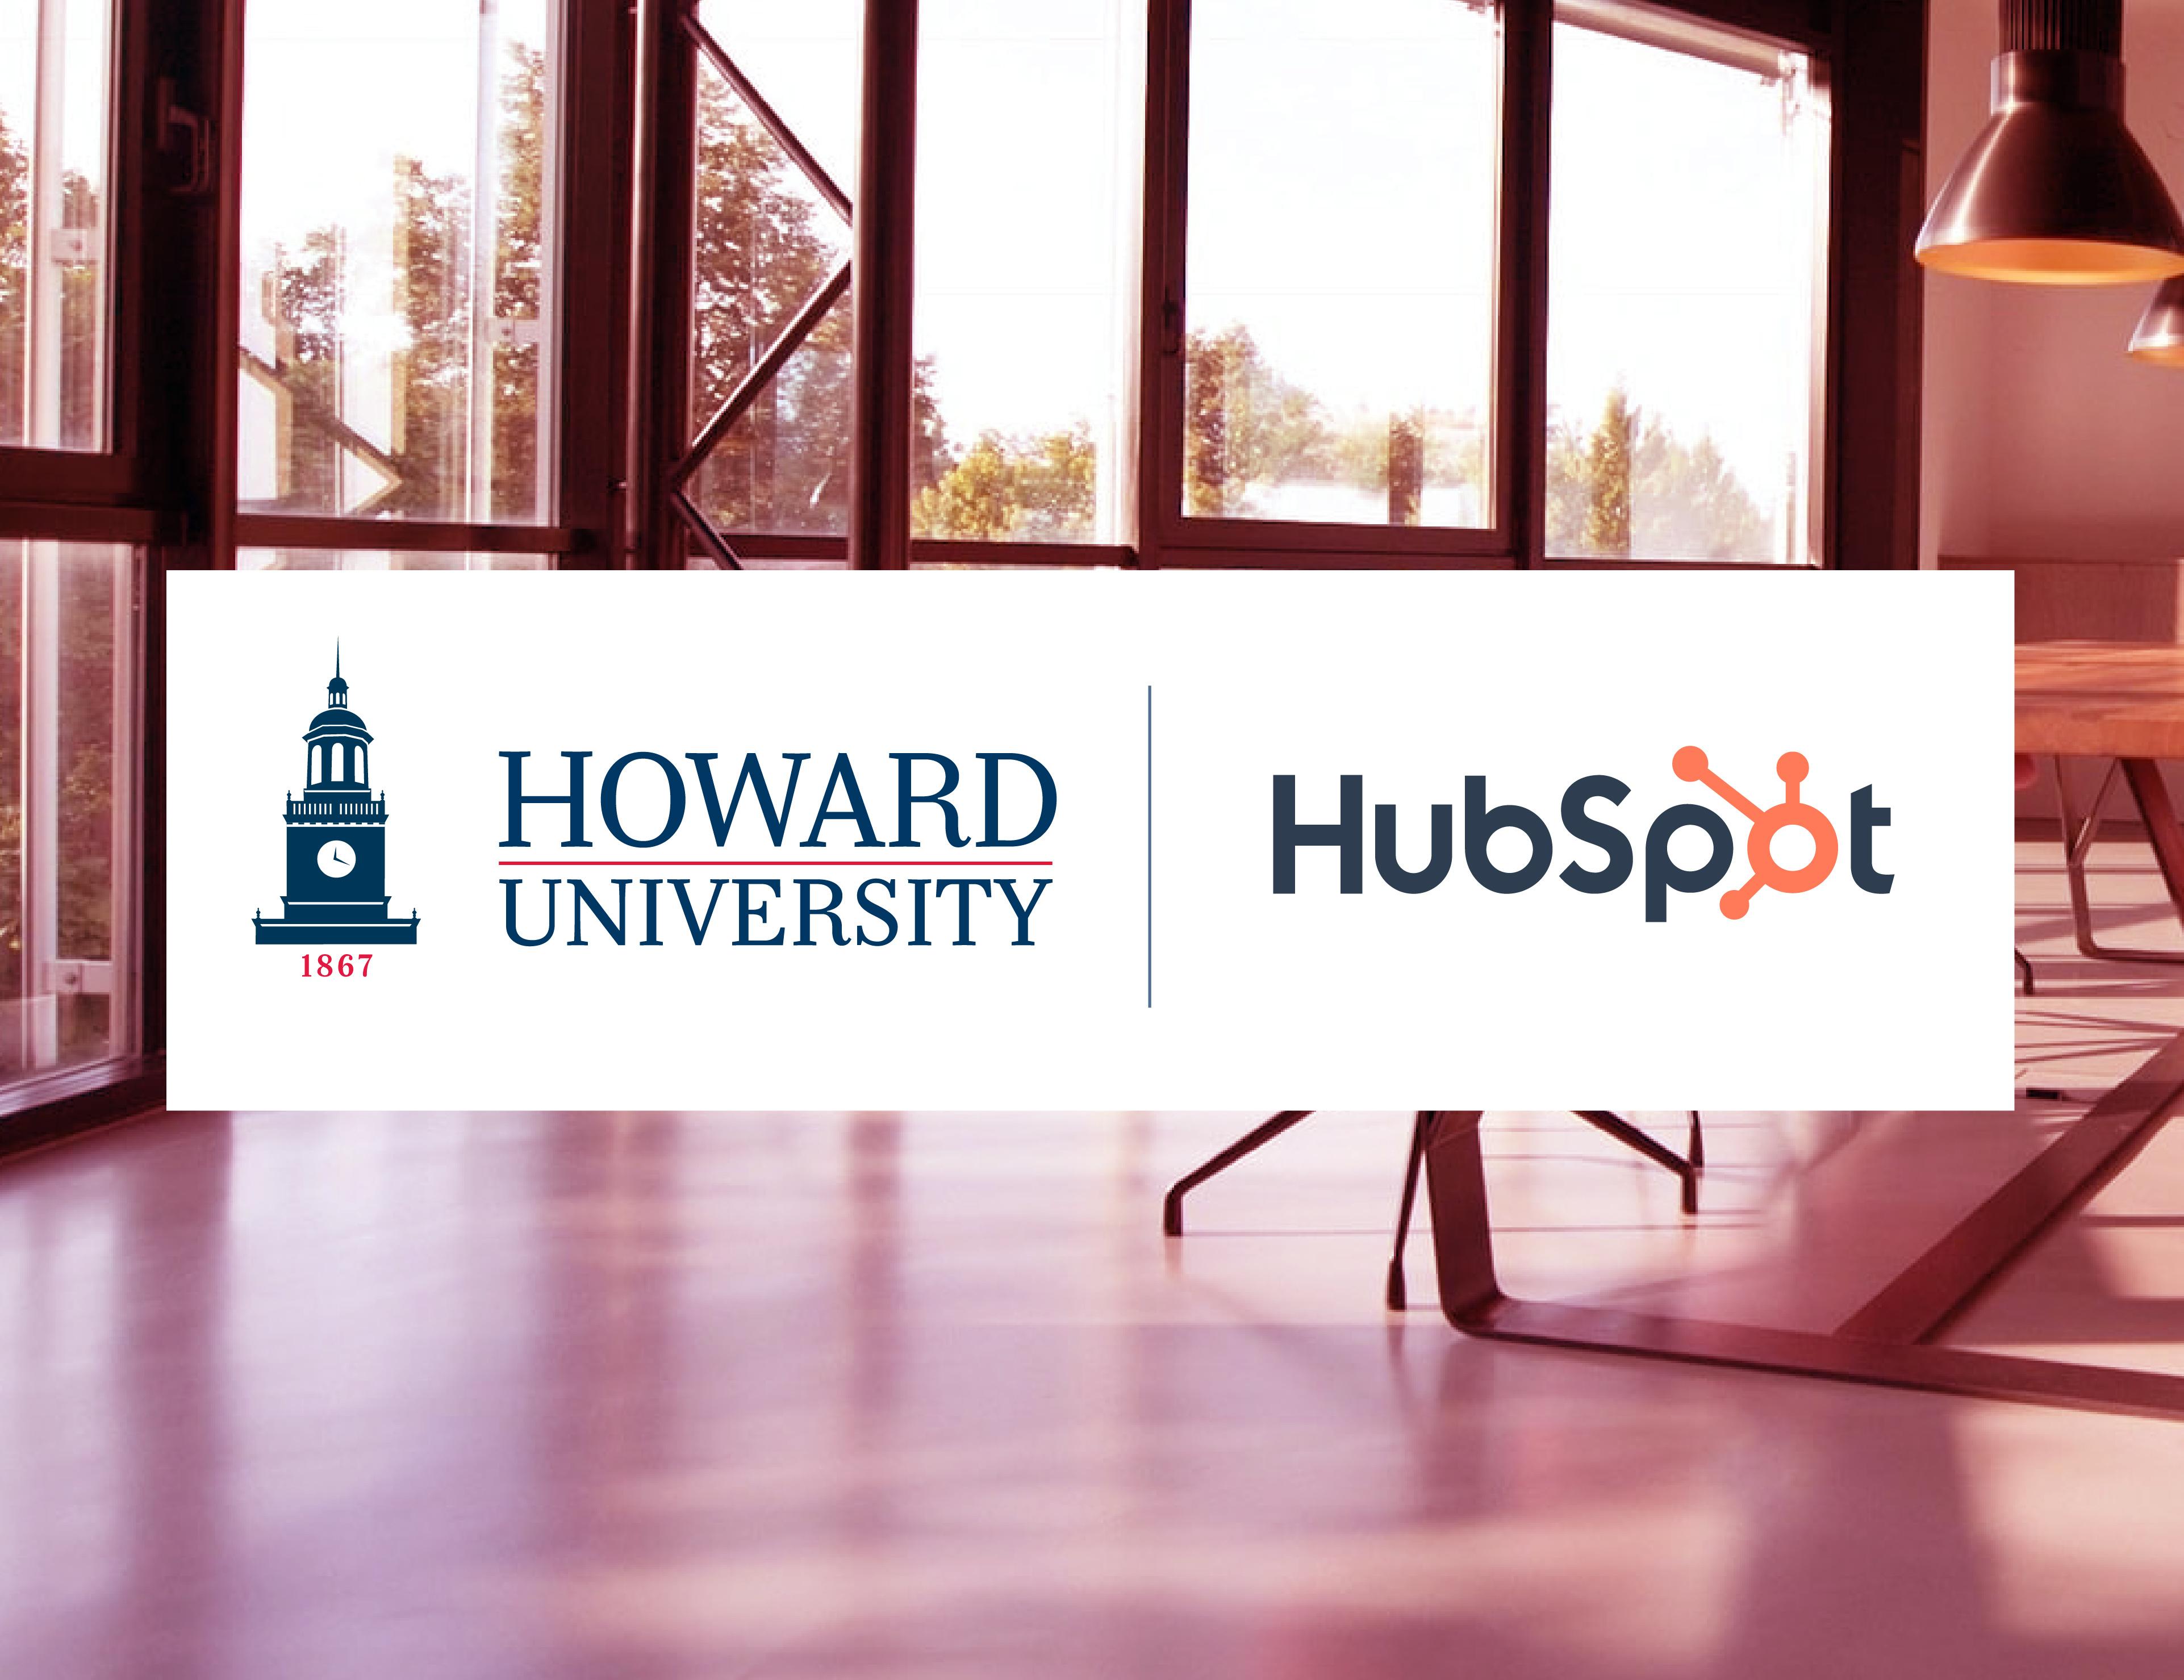 Howard University School of Business and HubSpot Partner to Establish a Center for Digital Business